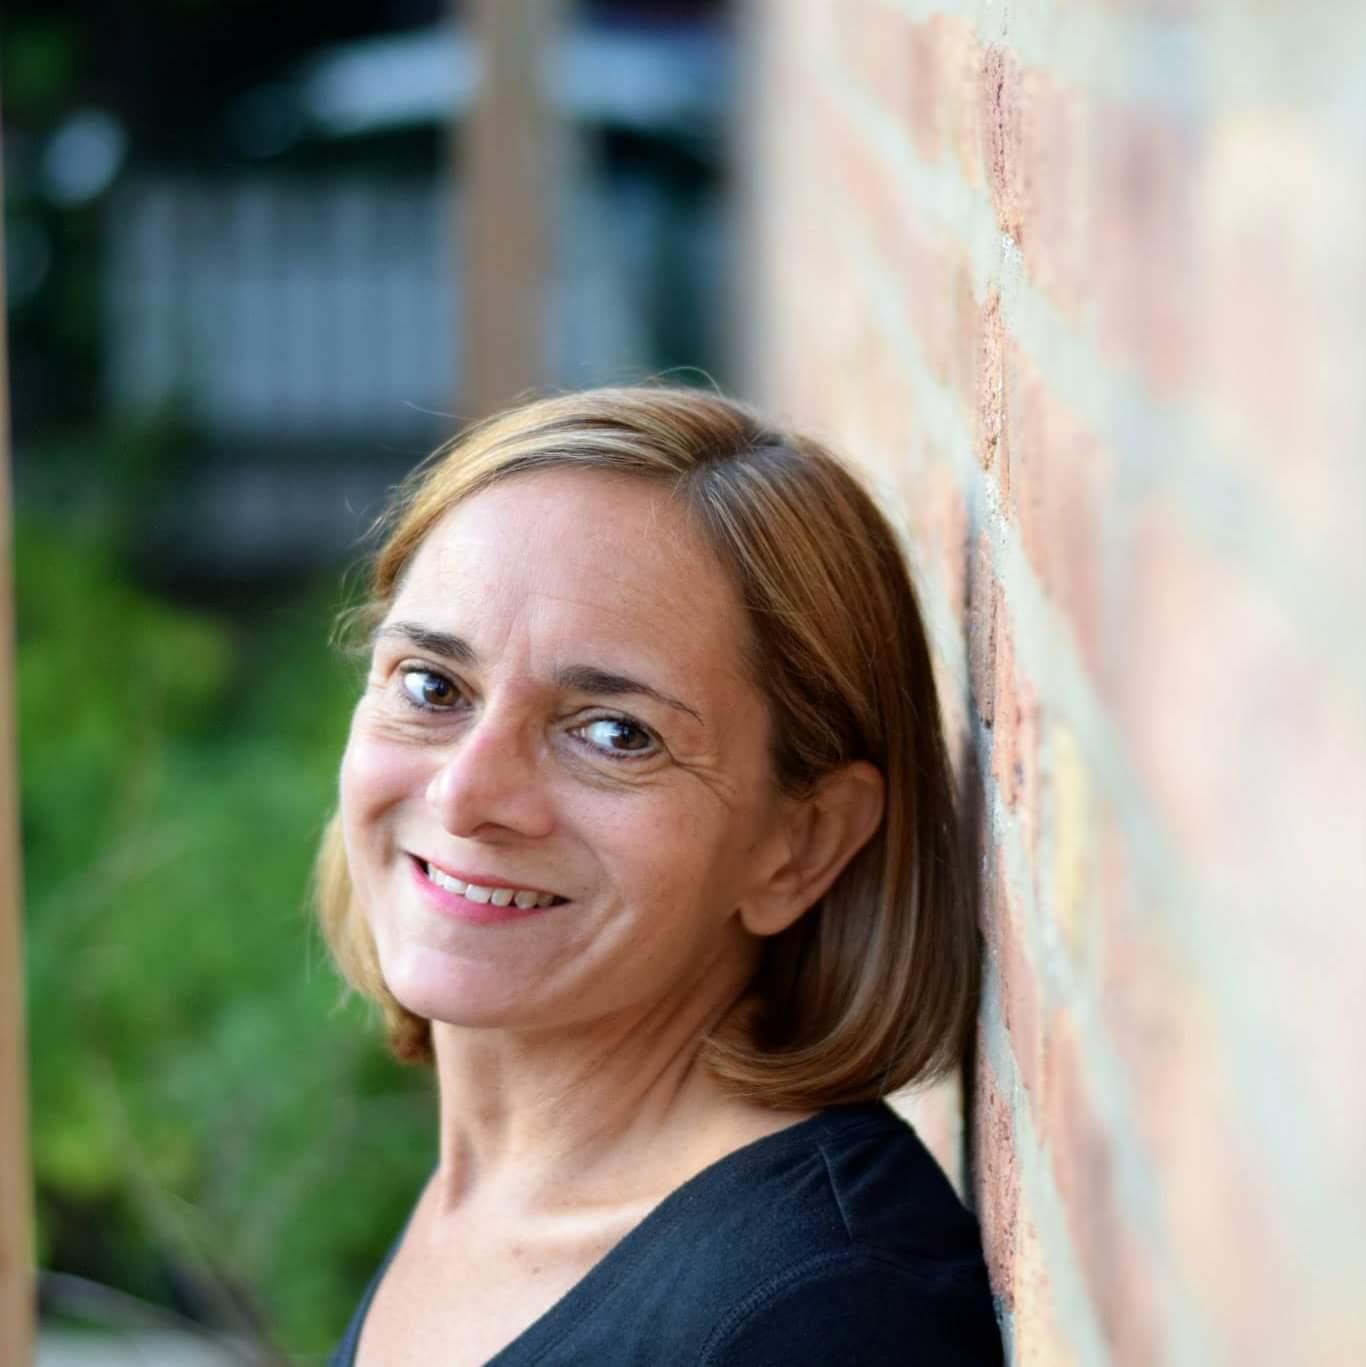 Sally Henson